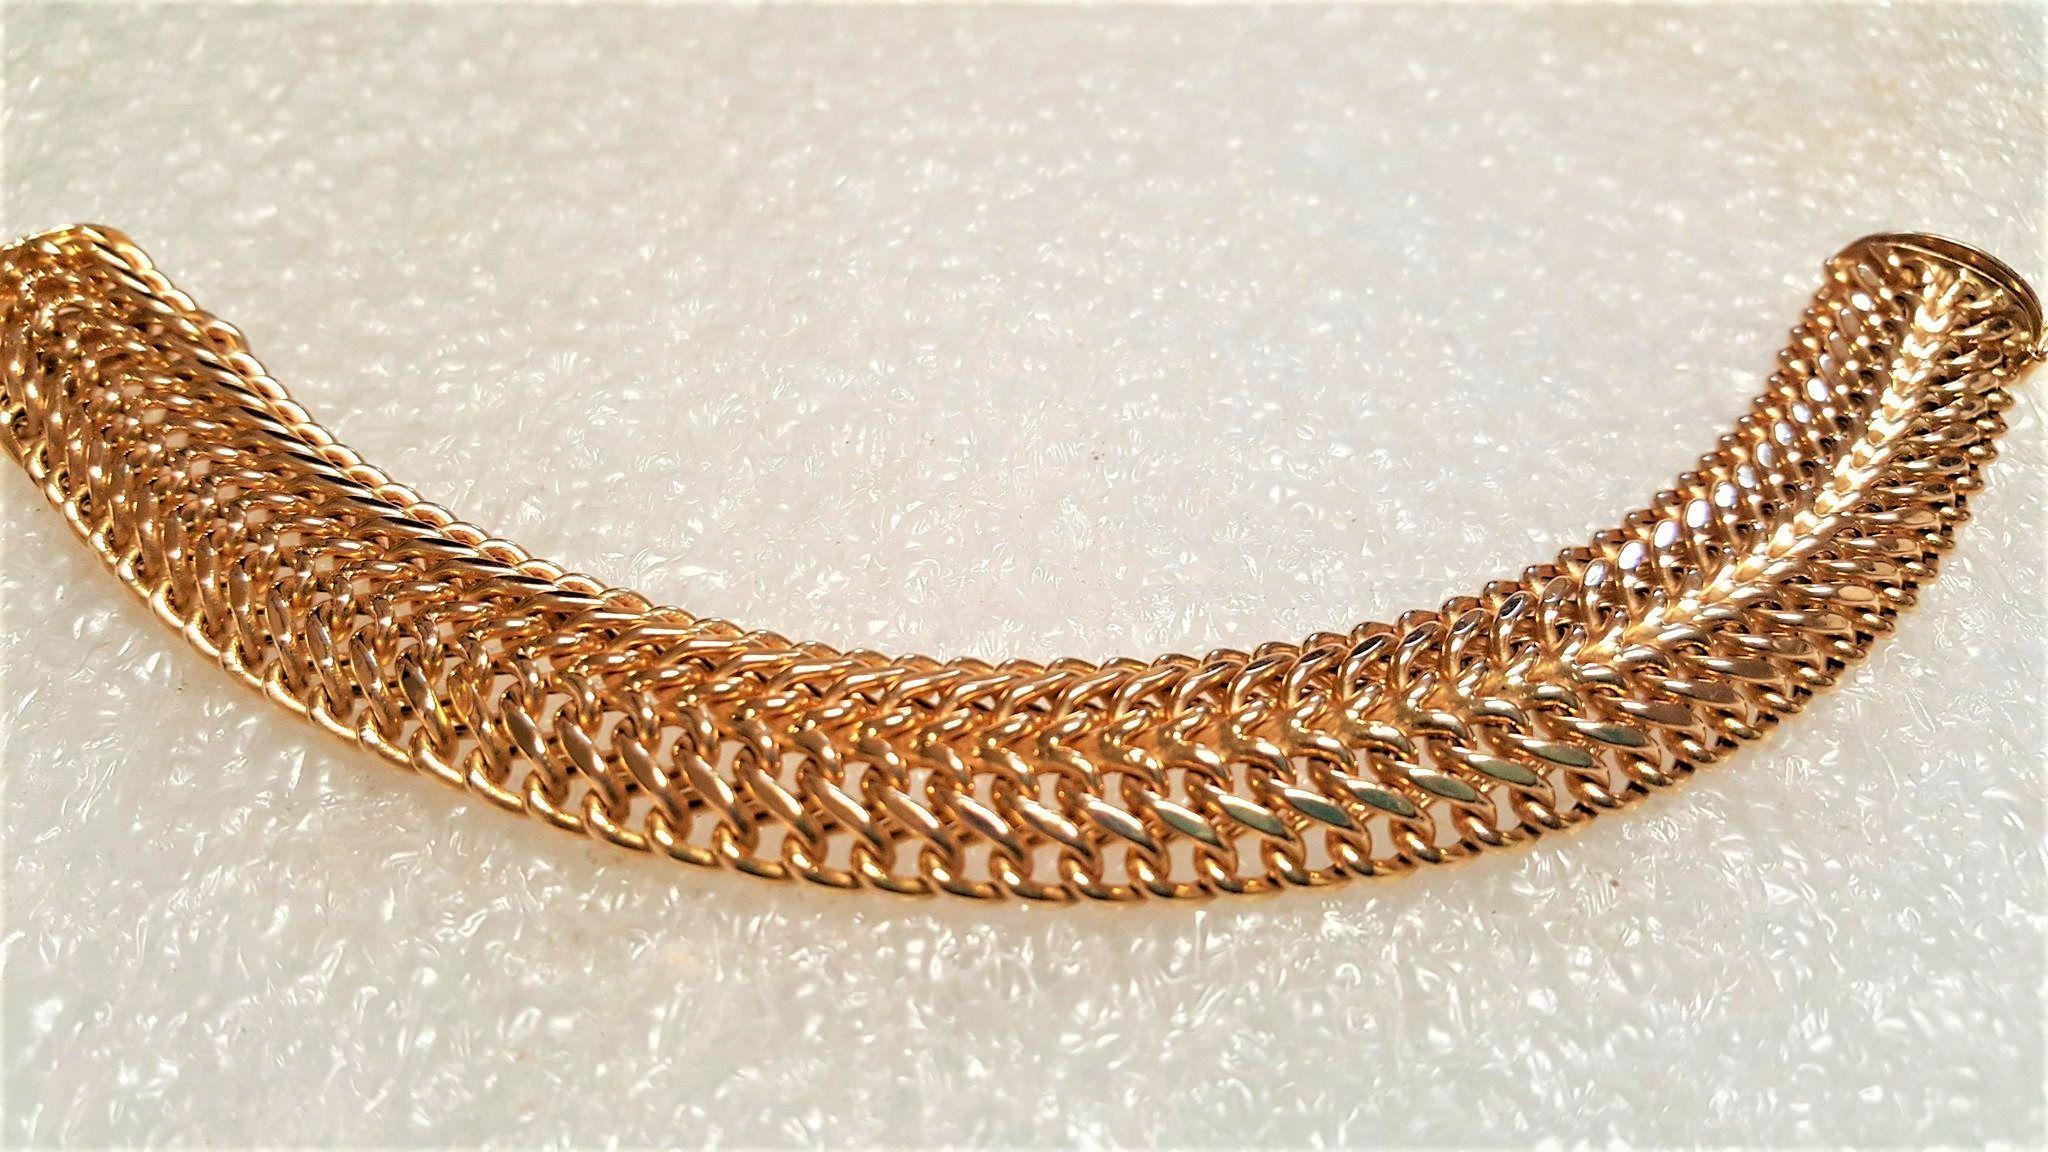 54f3c2af7aeb Vintage 14k Gold Wide Wheat Bracelet - Fine B M Italy 14k Yellow Gold Woven  Bracelet - Ladies 14k Gold Fancy Wide Spiga Chain Bracelet by  GranvilleGallery ...